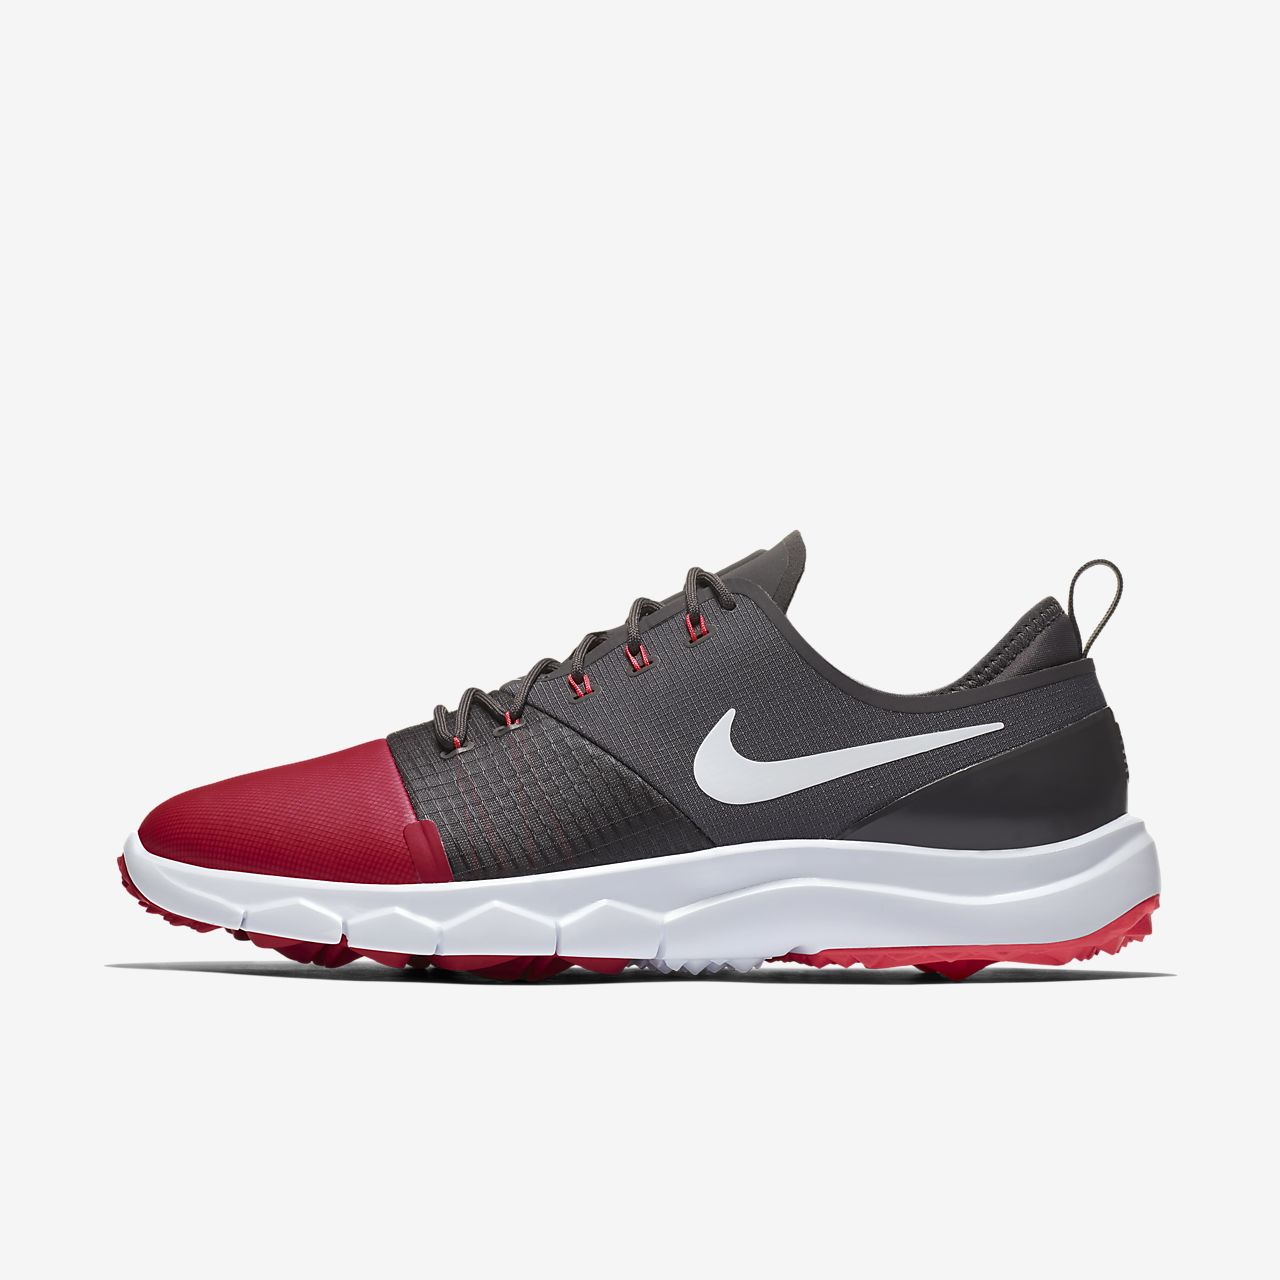 Calzado de golf para mujer Nike FI Impact 3